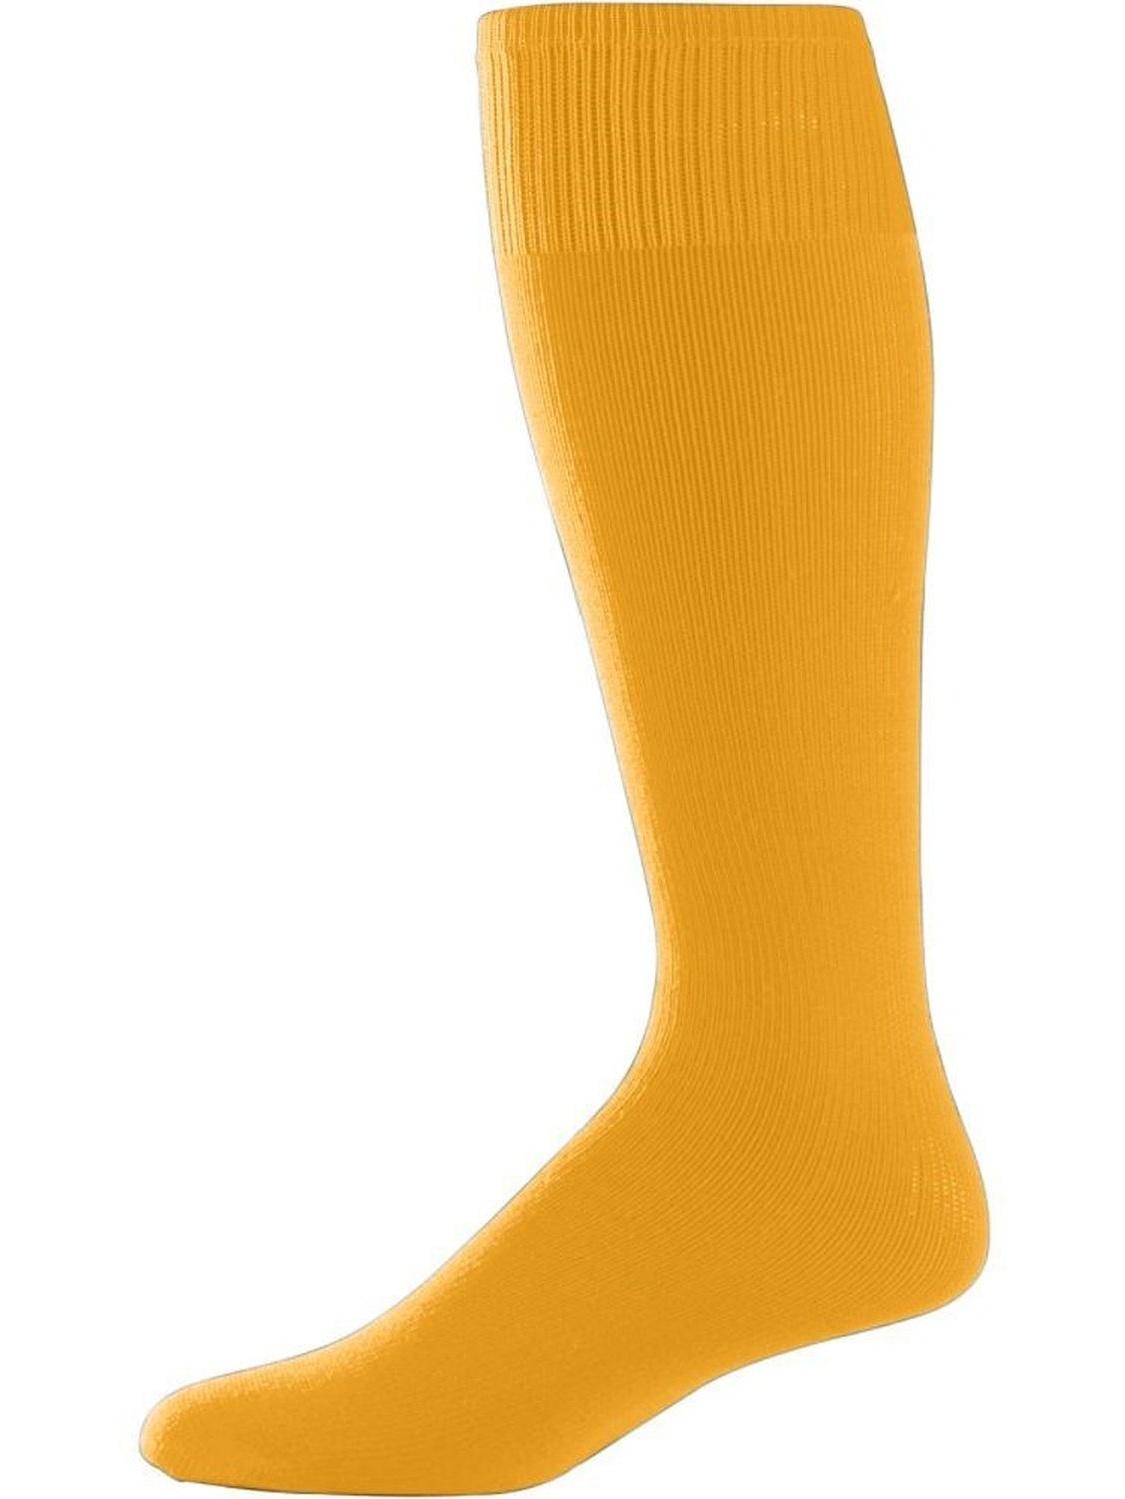 Gold Adult Sport Socks (Pair) Mens Womans Athletic Sports Baseball Softball